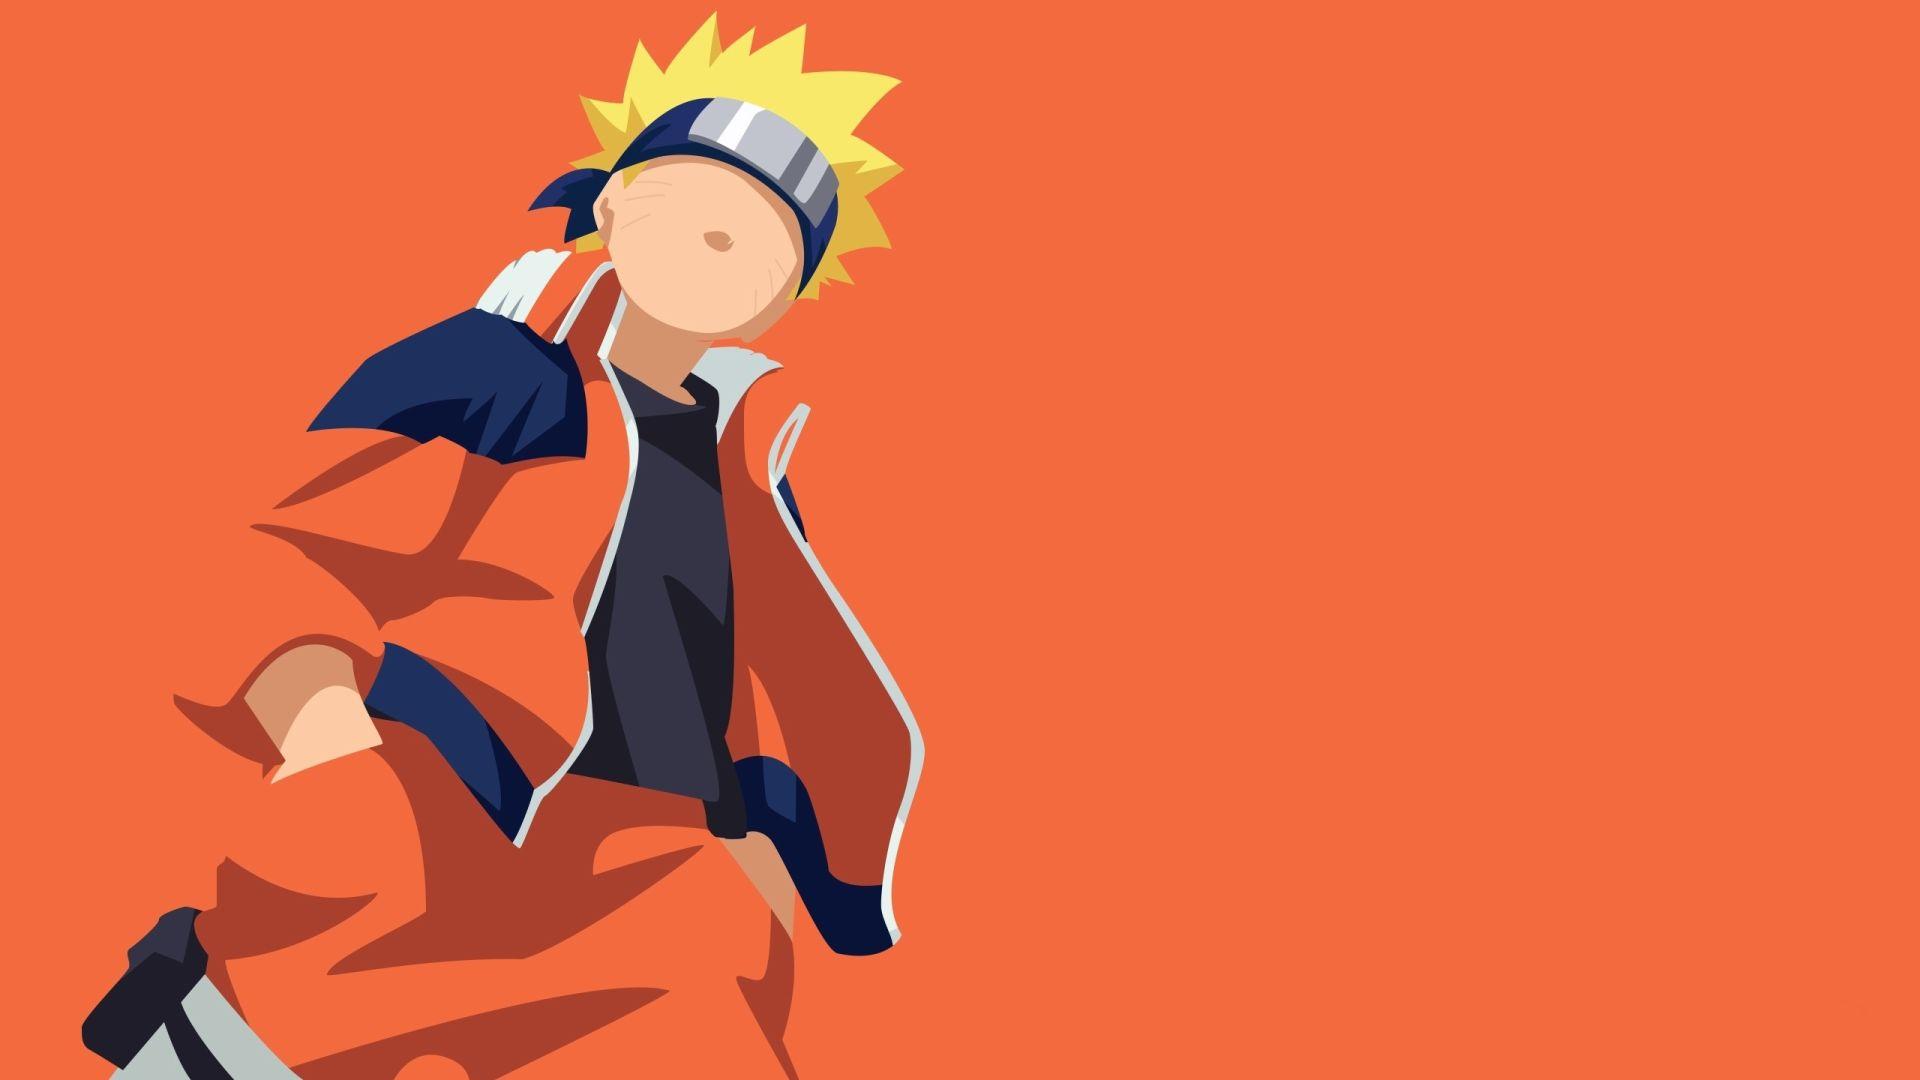 Naruto Minimalist, Computer Wallpaper